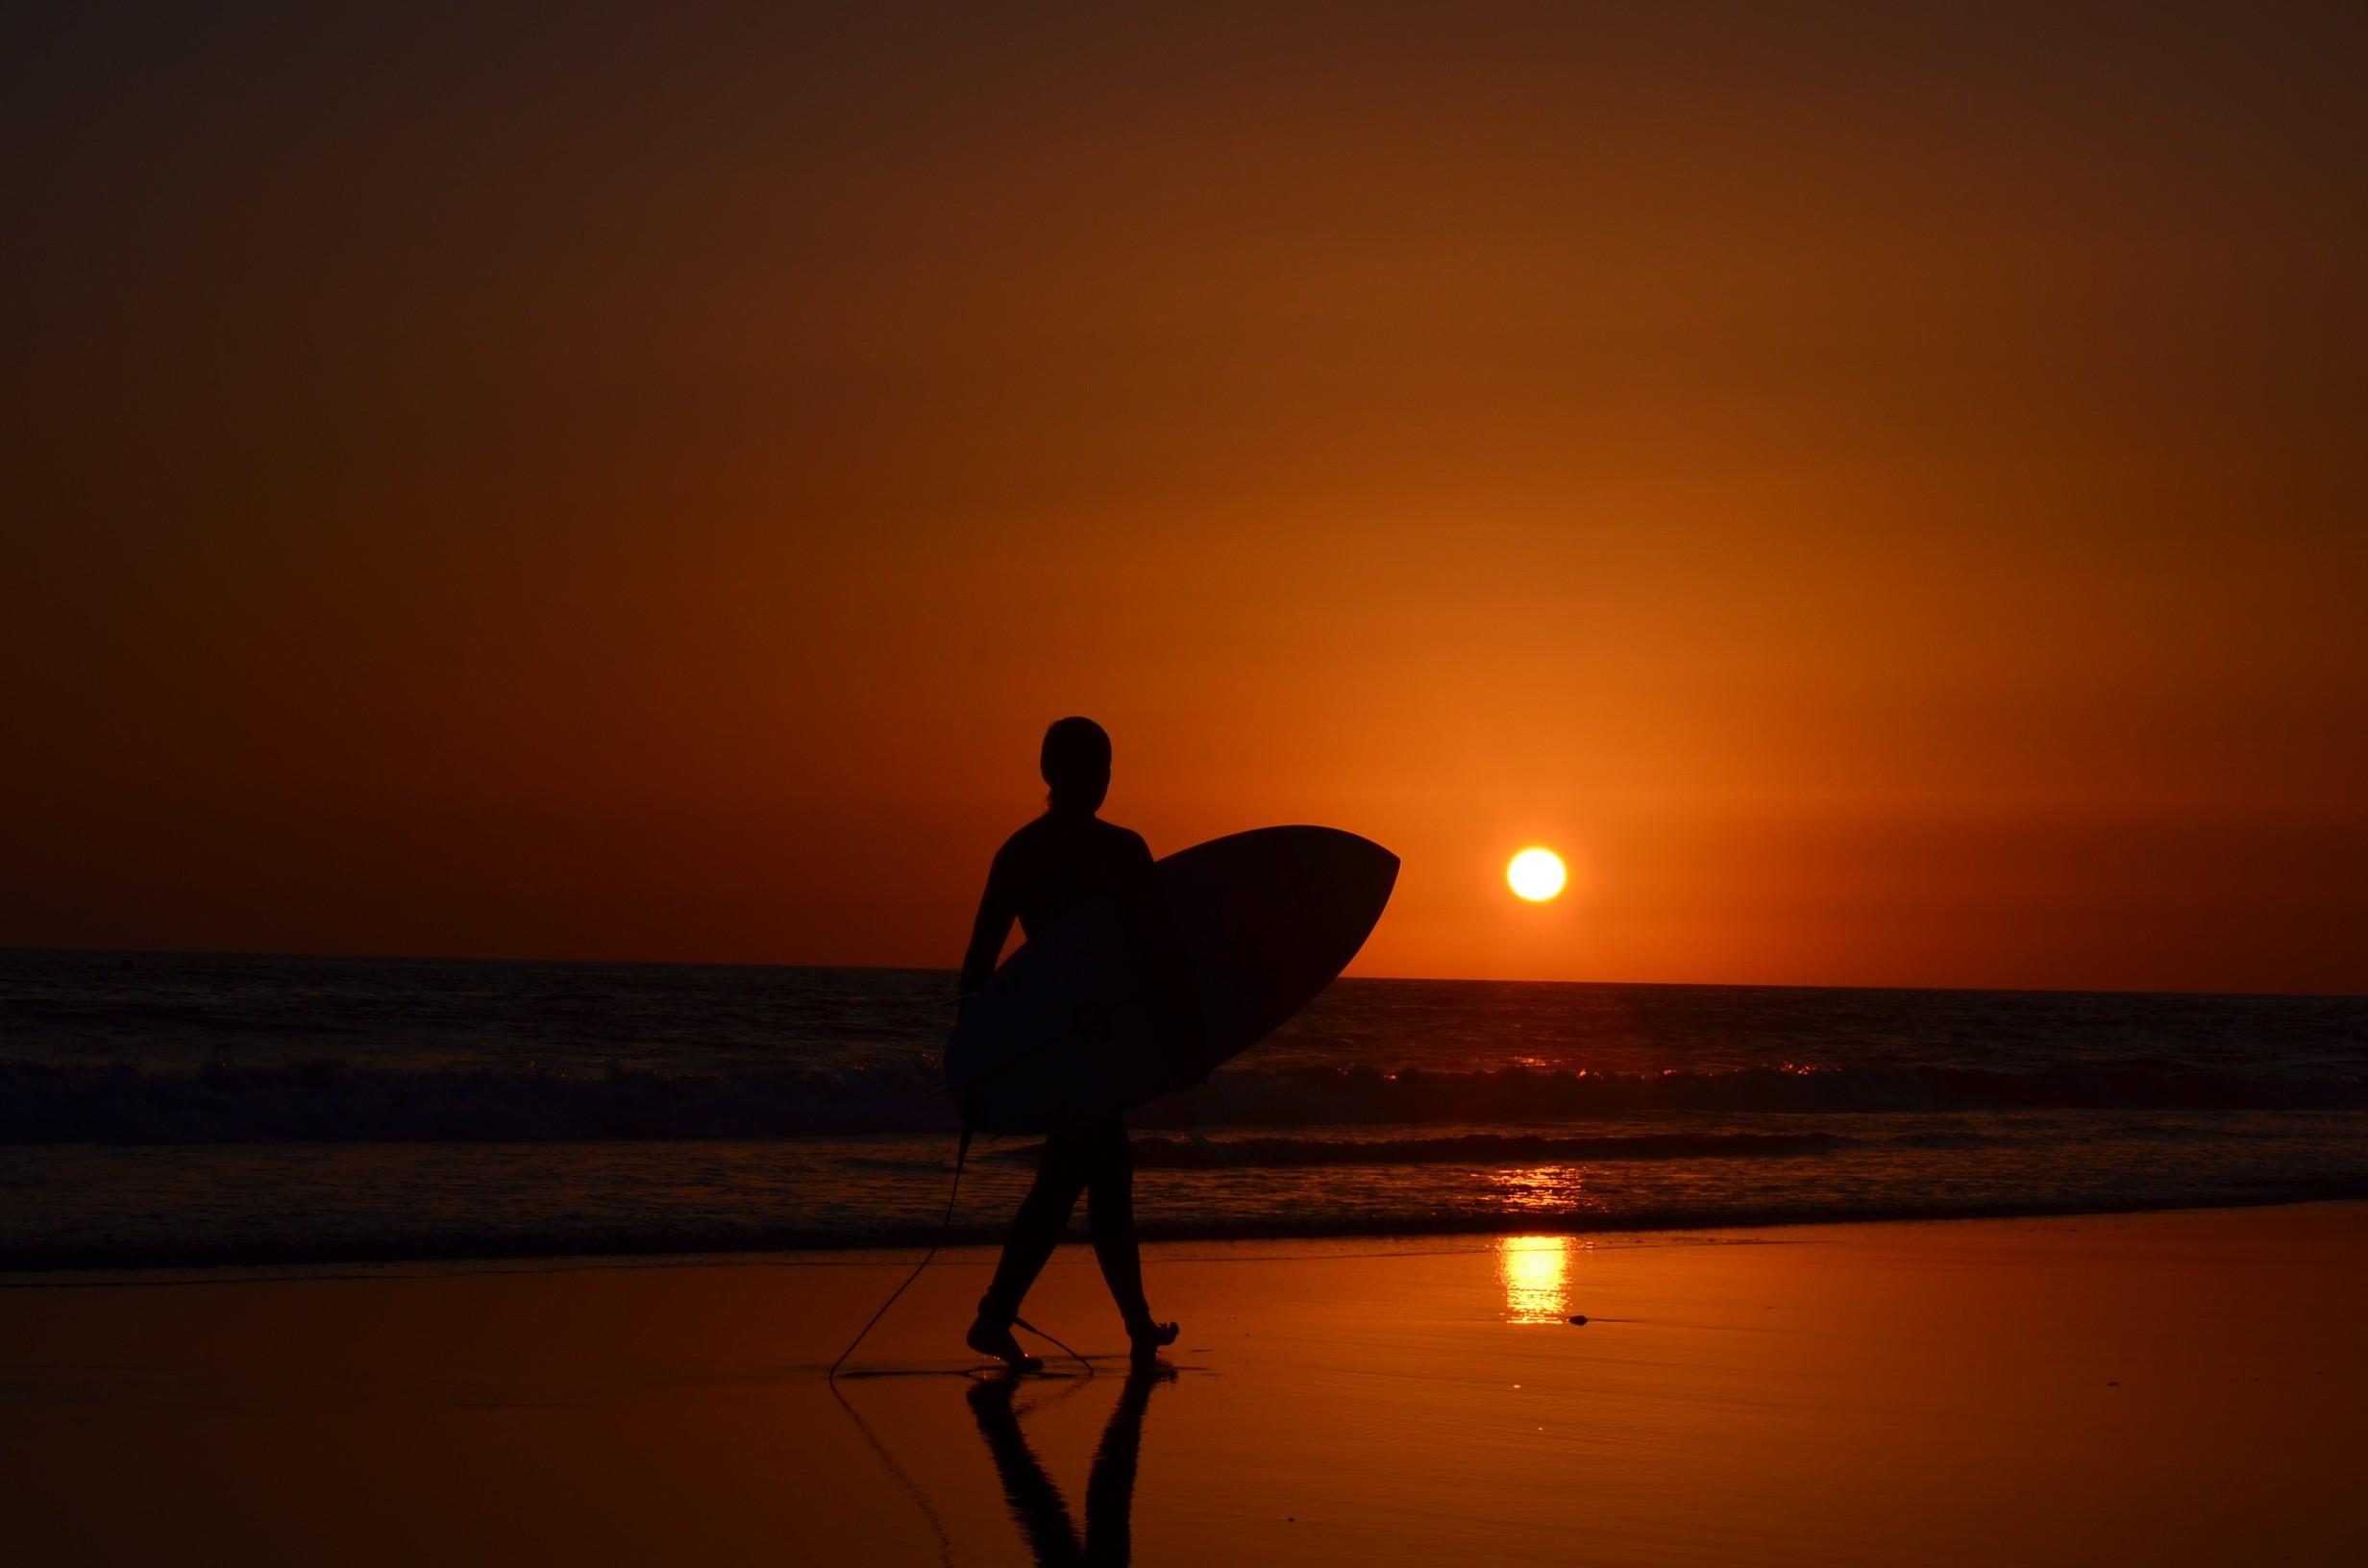 Wallpaper Sunlight Sunset Sea Reflection Silhouette